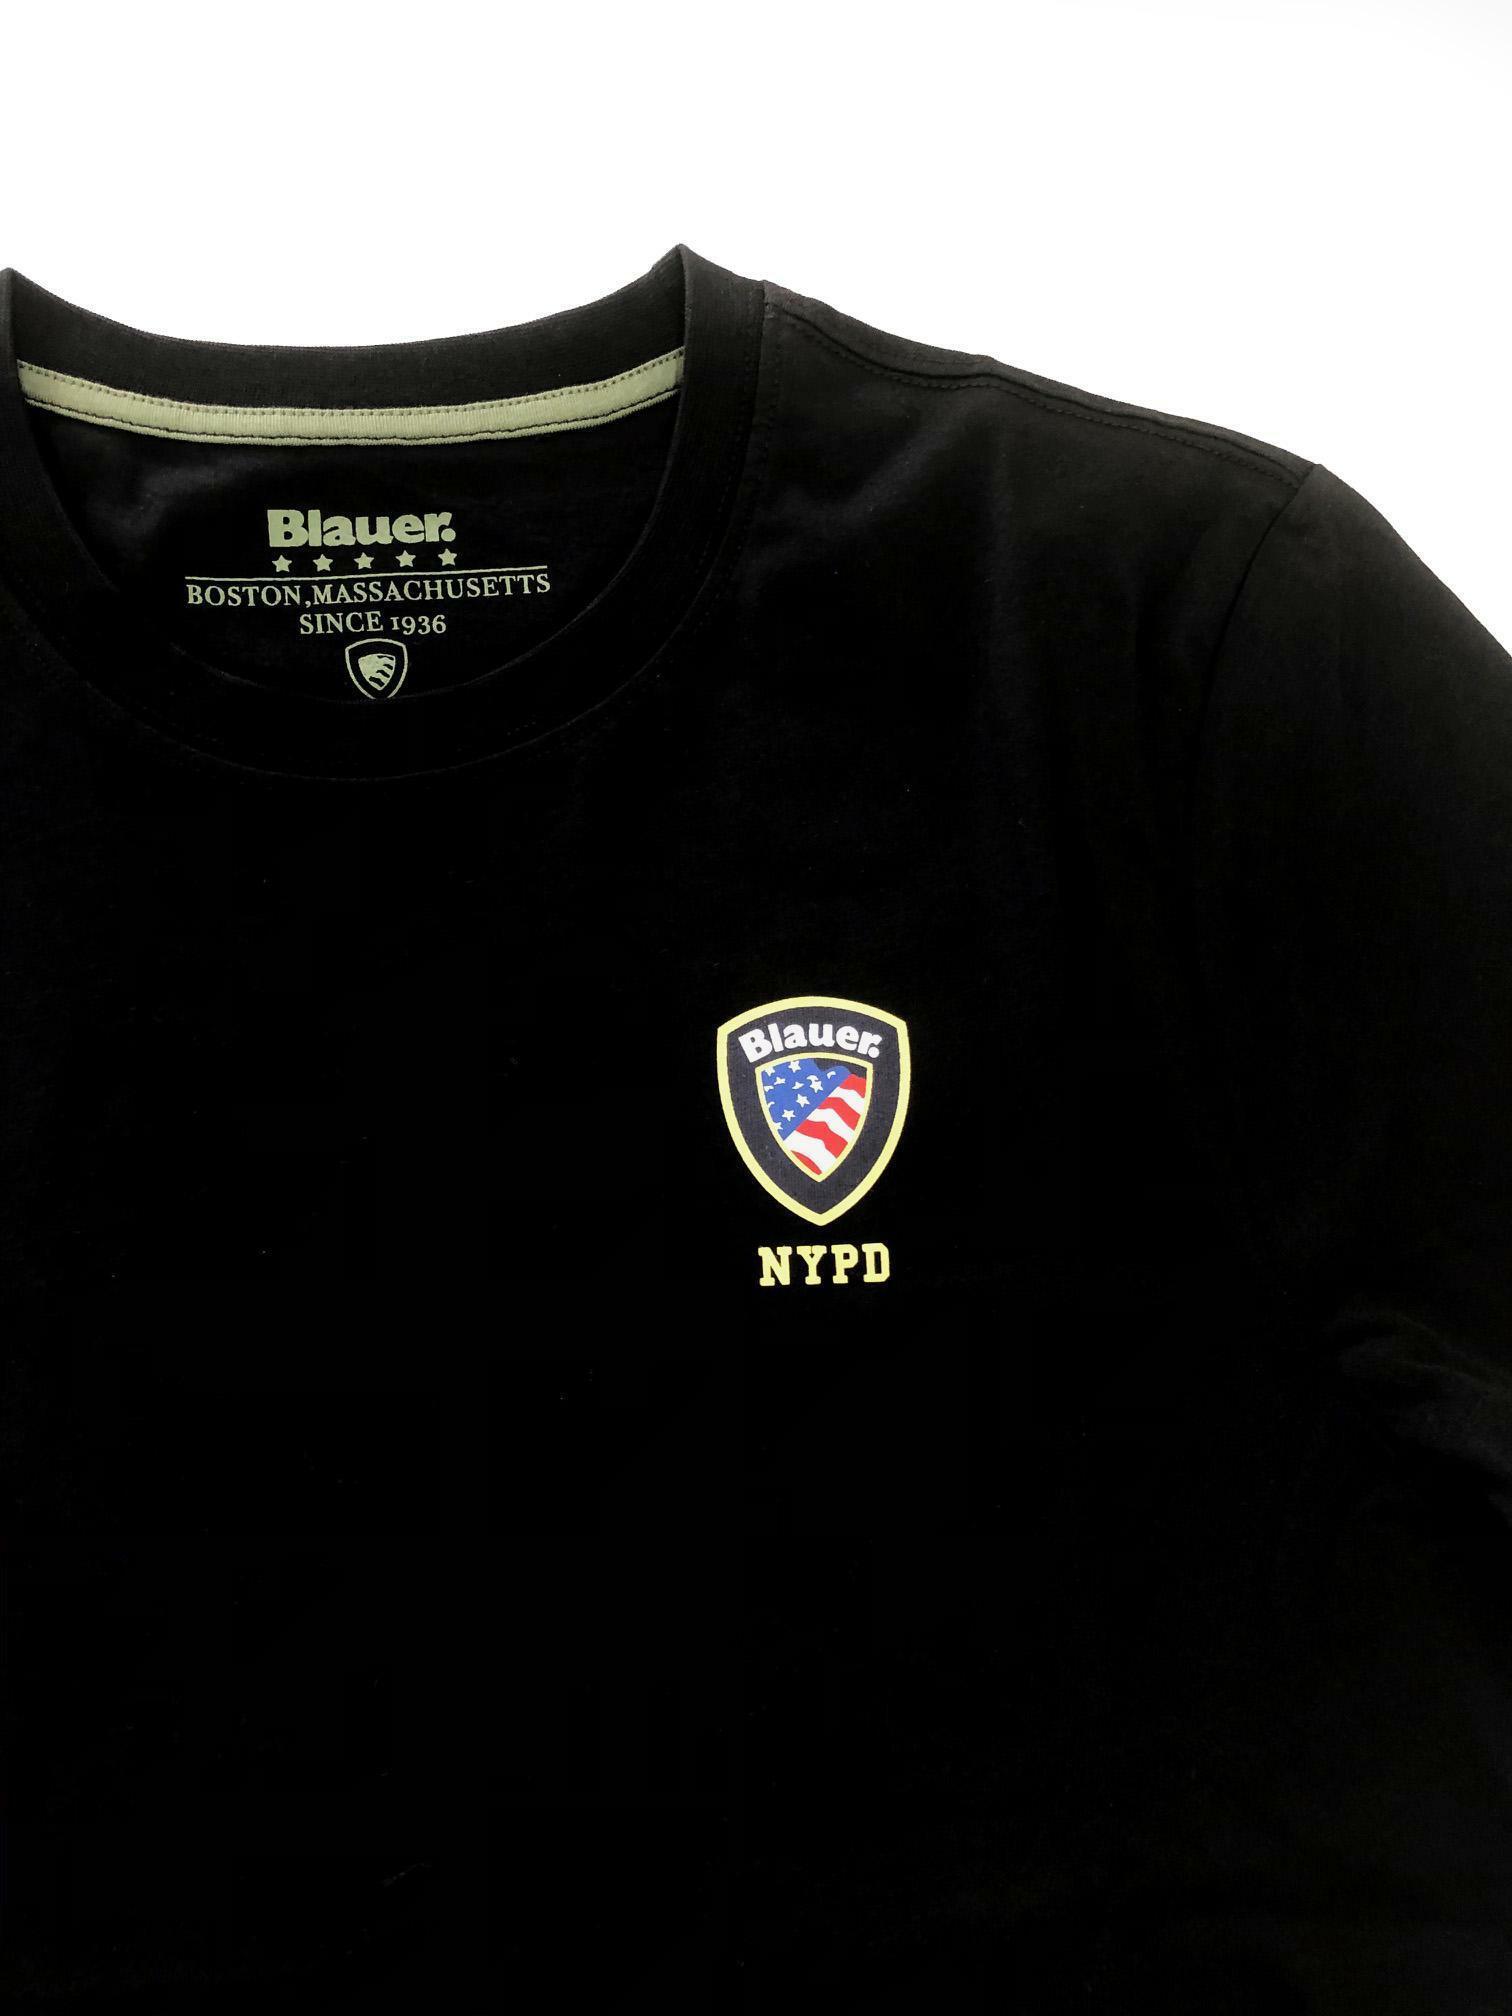 blauer t-shirt blauer uomo nero 20sbluh02176